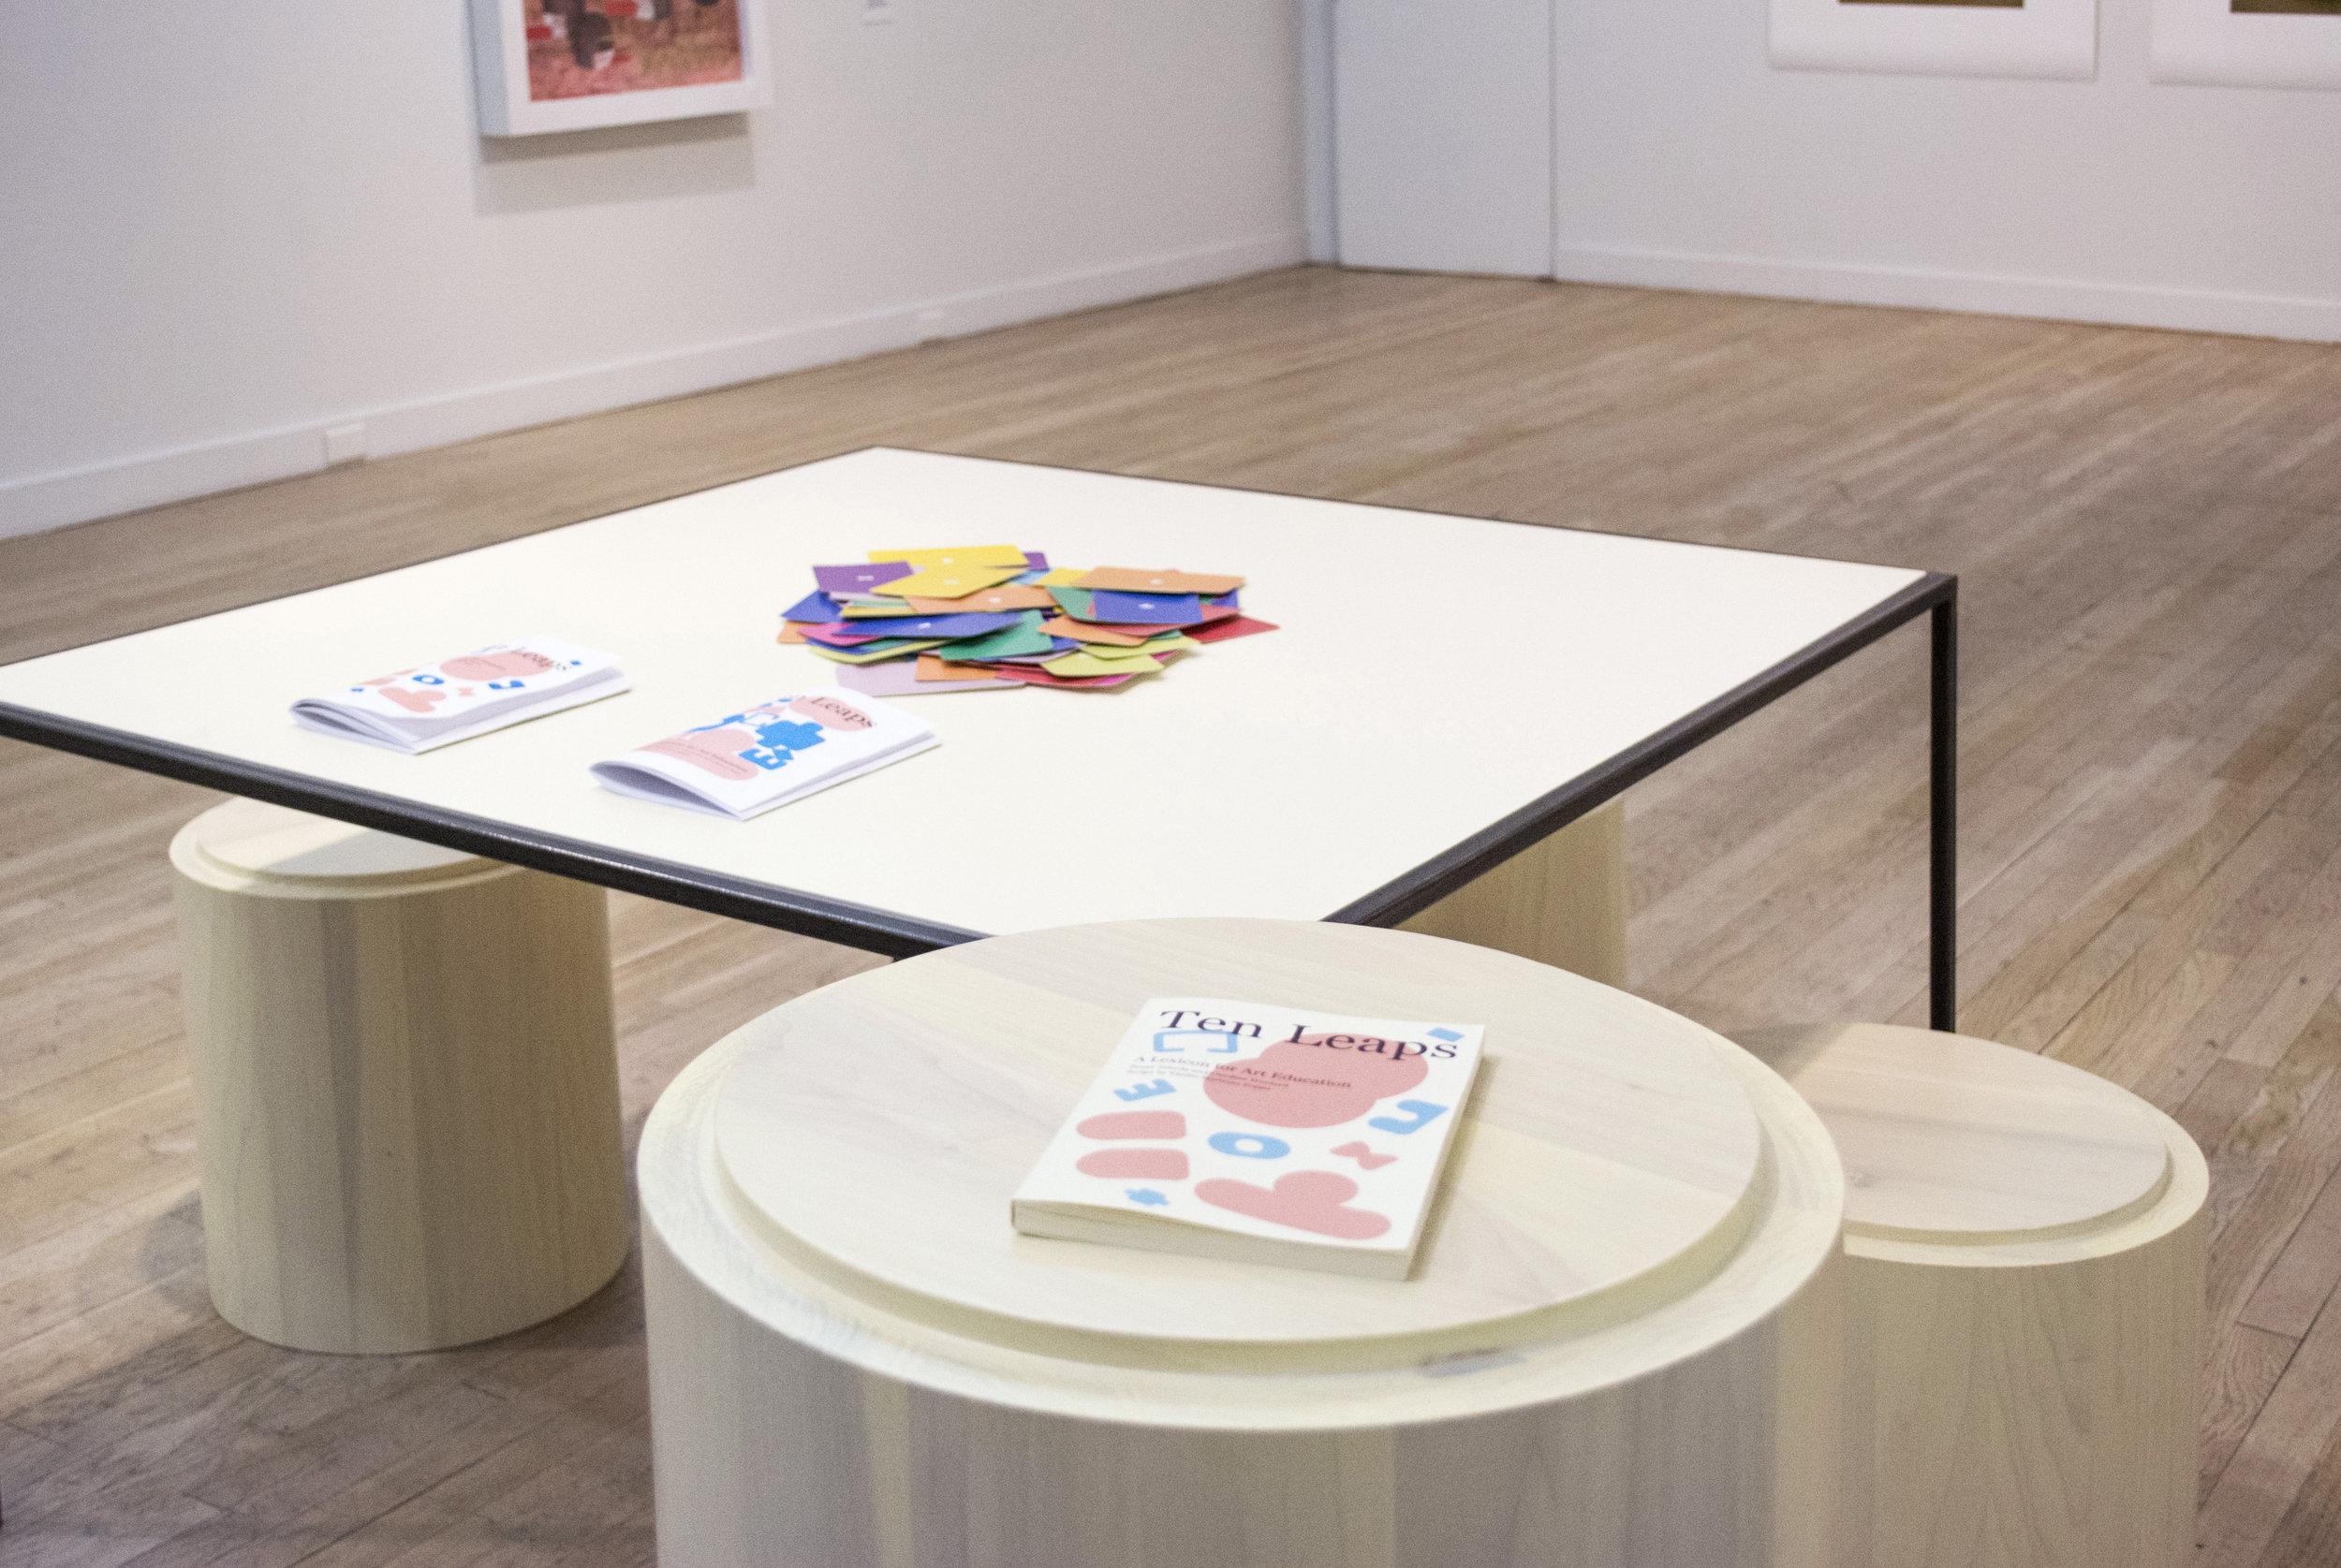 Susan Jahoda, Emilio Martinez Poppe, and Caroline Woolard of BFAMFAPhD, Ten Leaps: A Lexicon for Art Education , 2015-ongoing